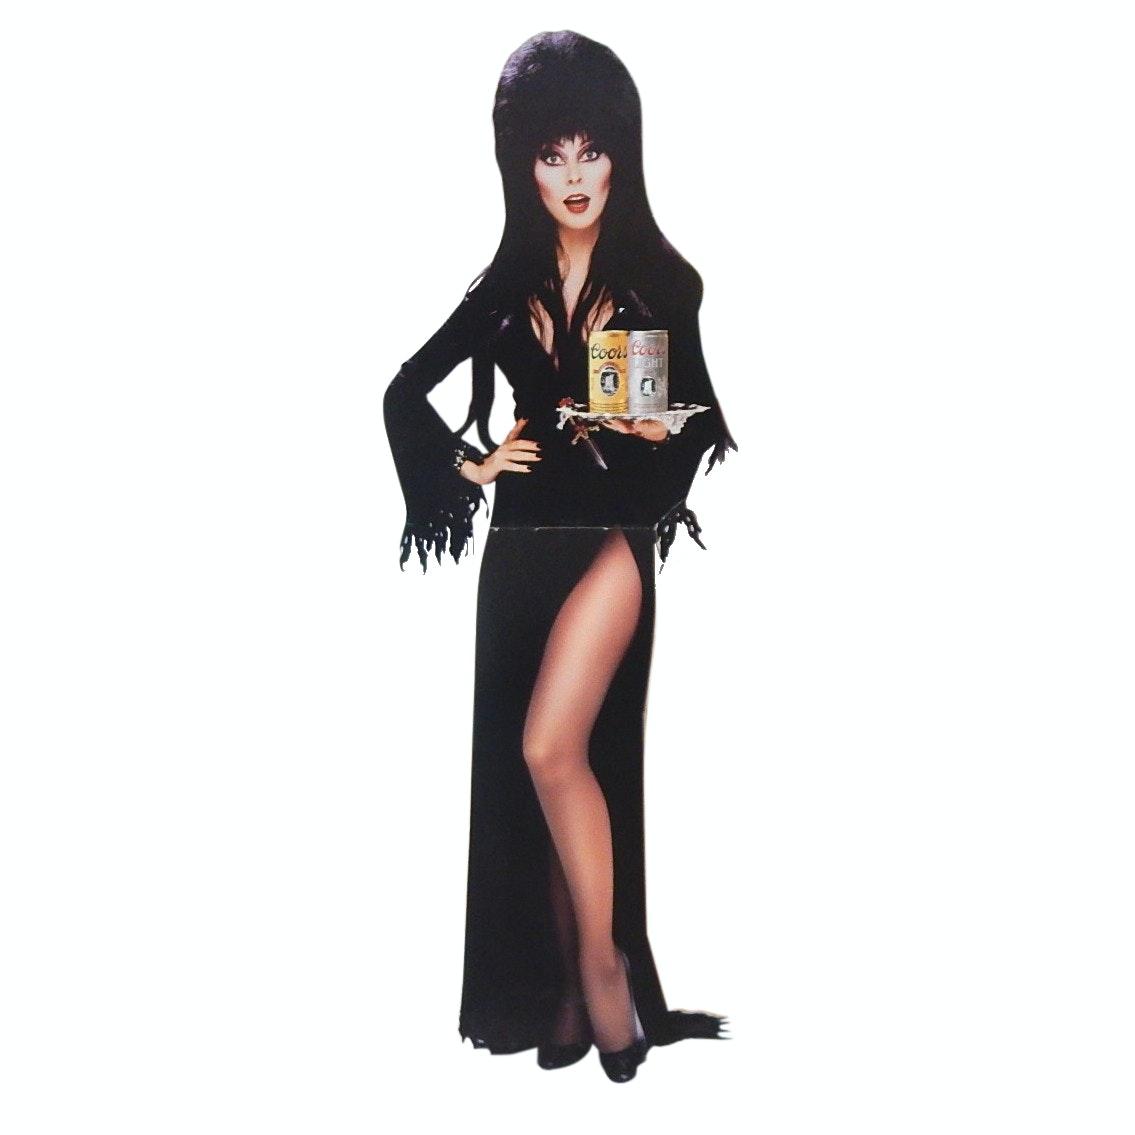 Elvira Coors Light Advertising Stand Up Cardboard Cut Out